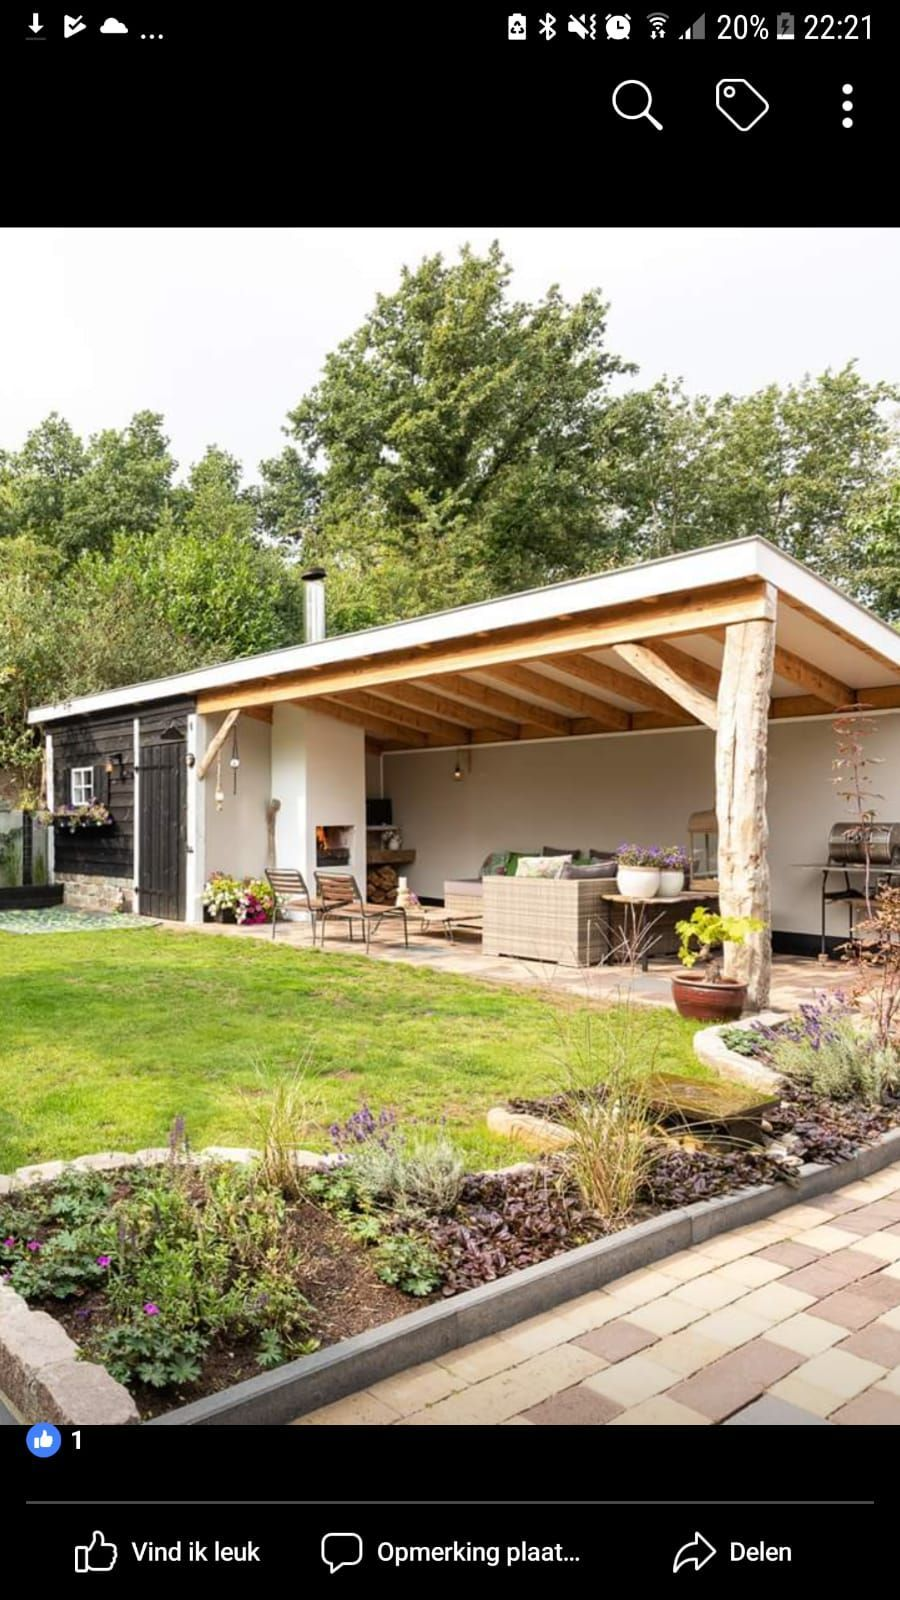 Full Size of Terrassen Pavillon In 2020 Backyard Patio Designs Garten Wohnzimmer Terrassen Pavillon